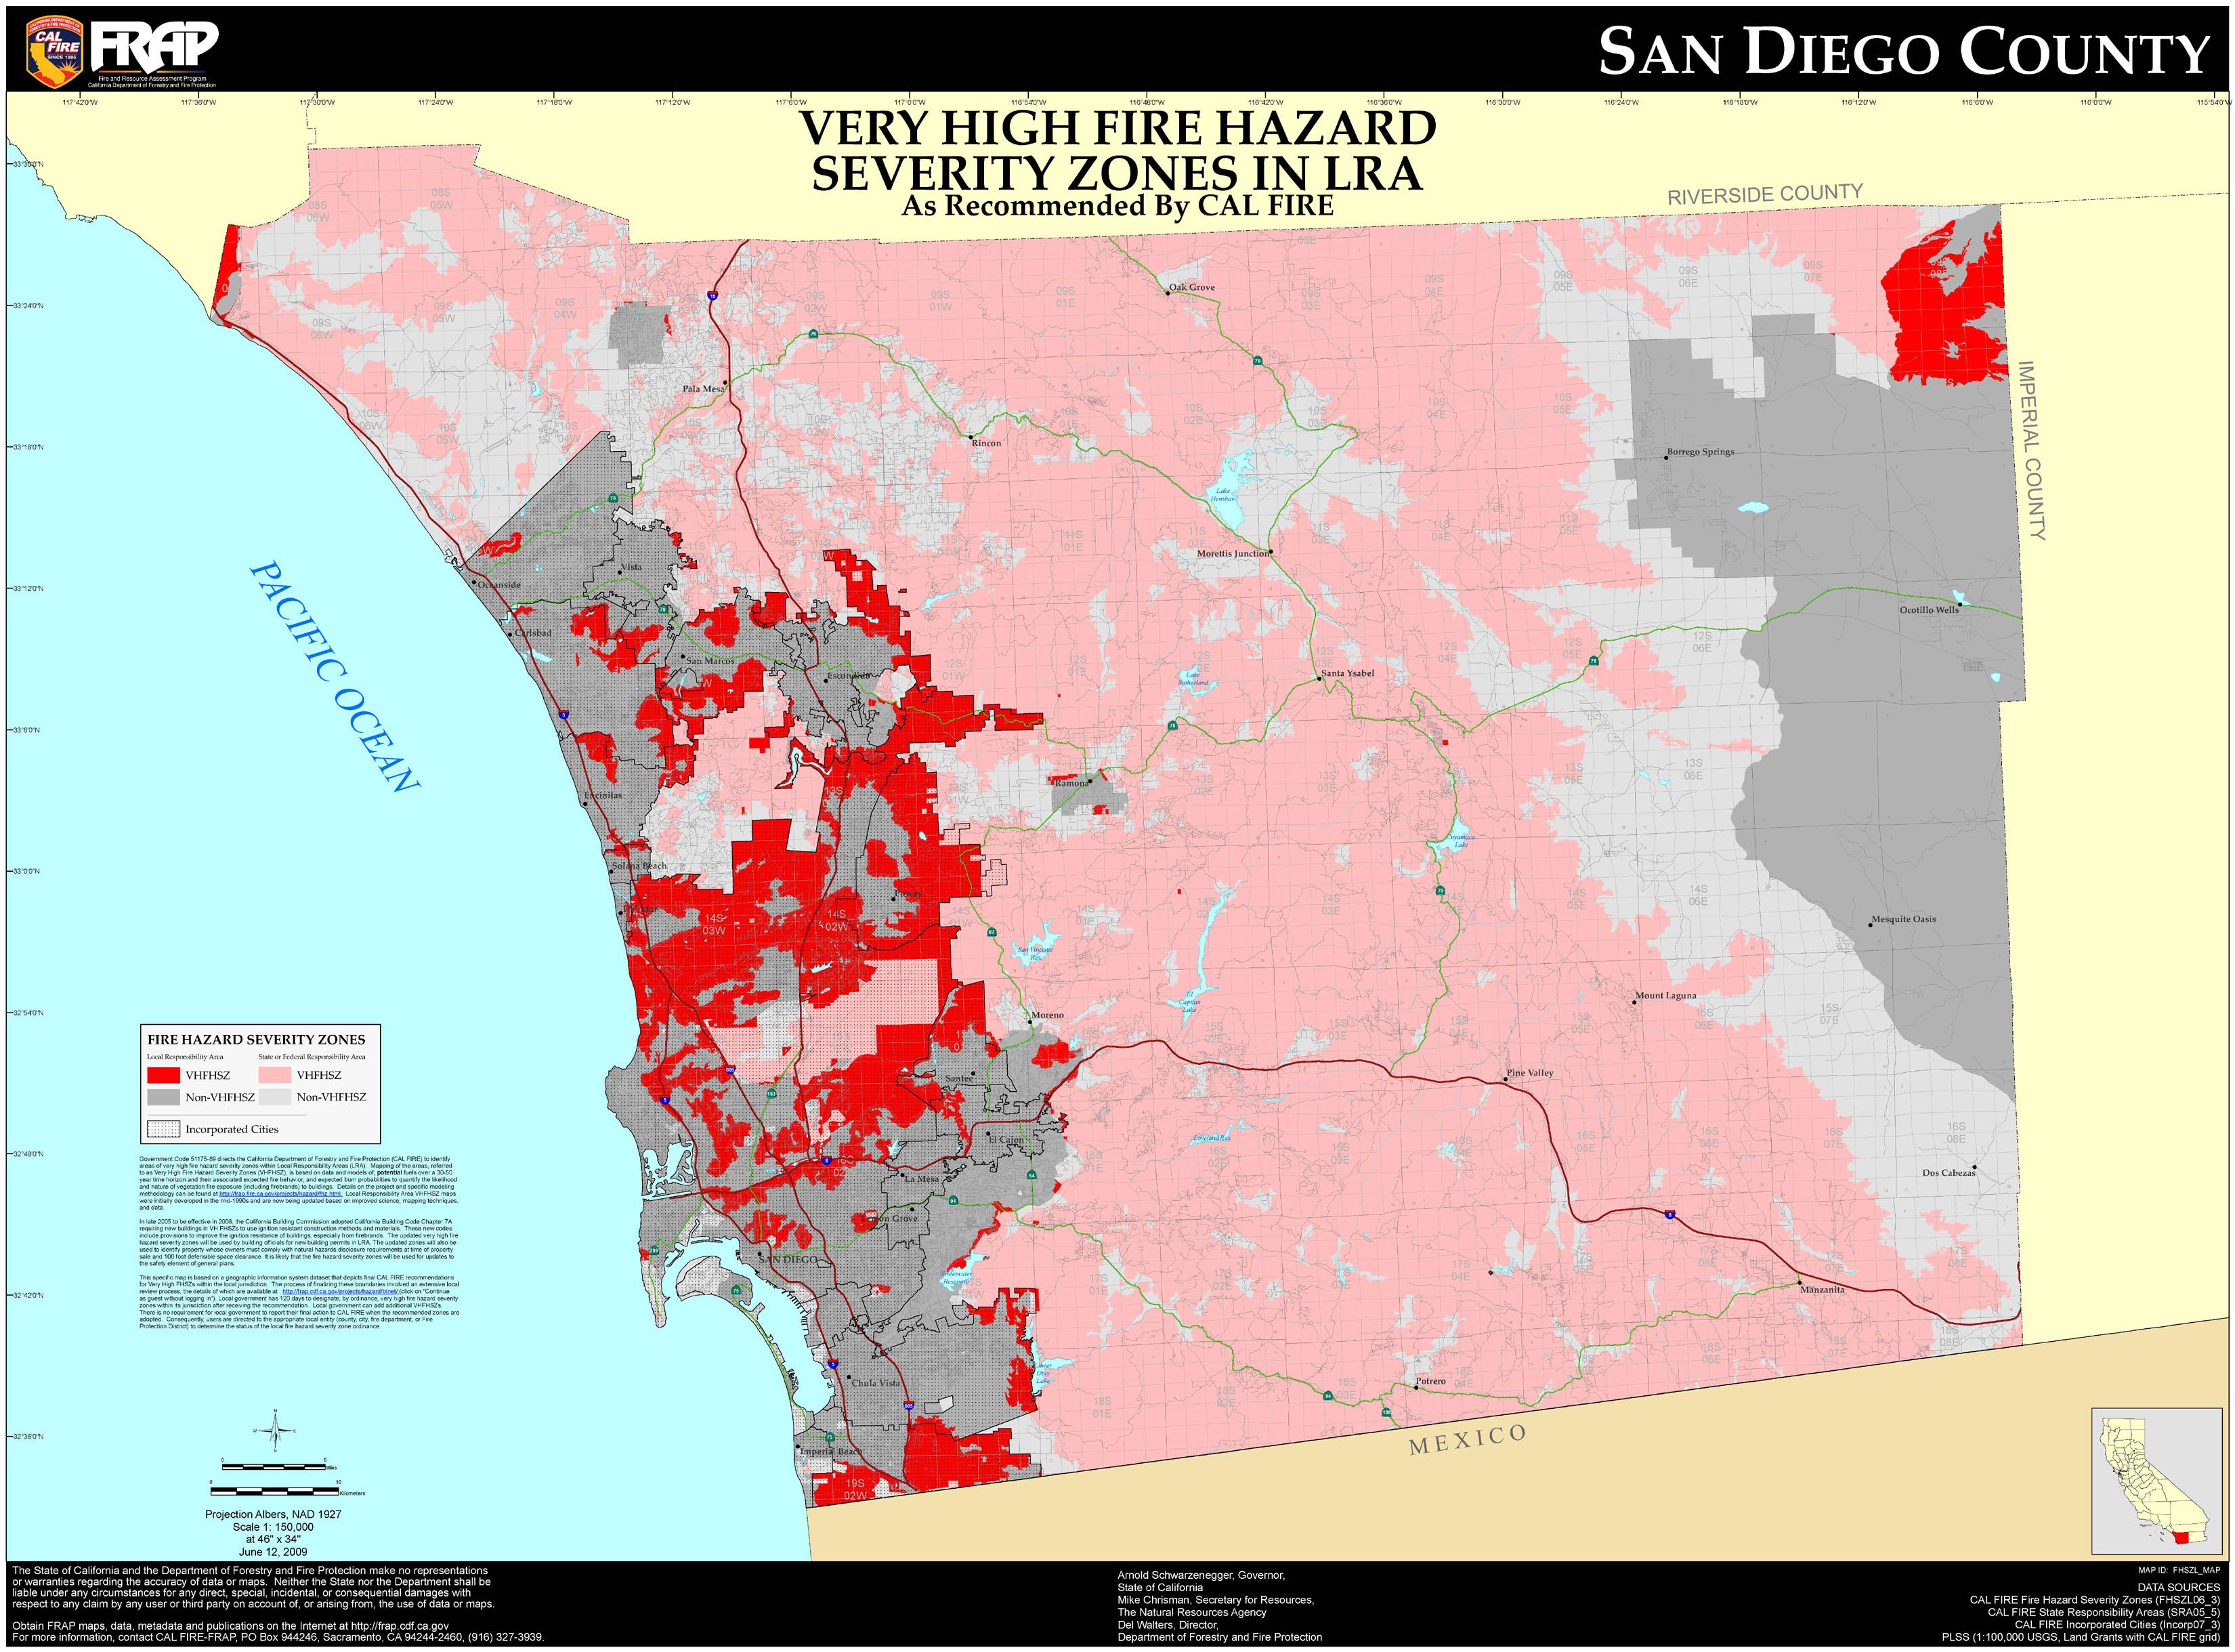 Northern California Fires Map - Klipy - Active Fire Map California